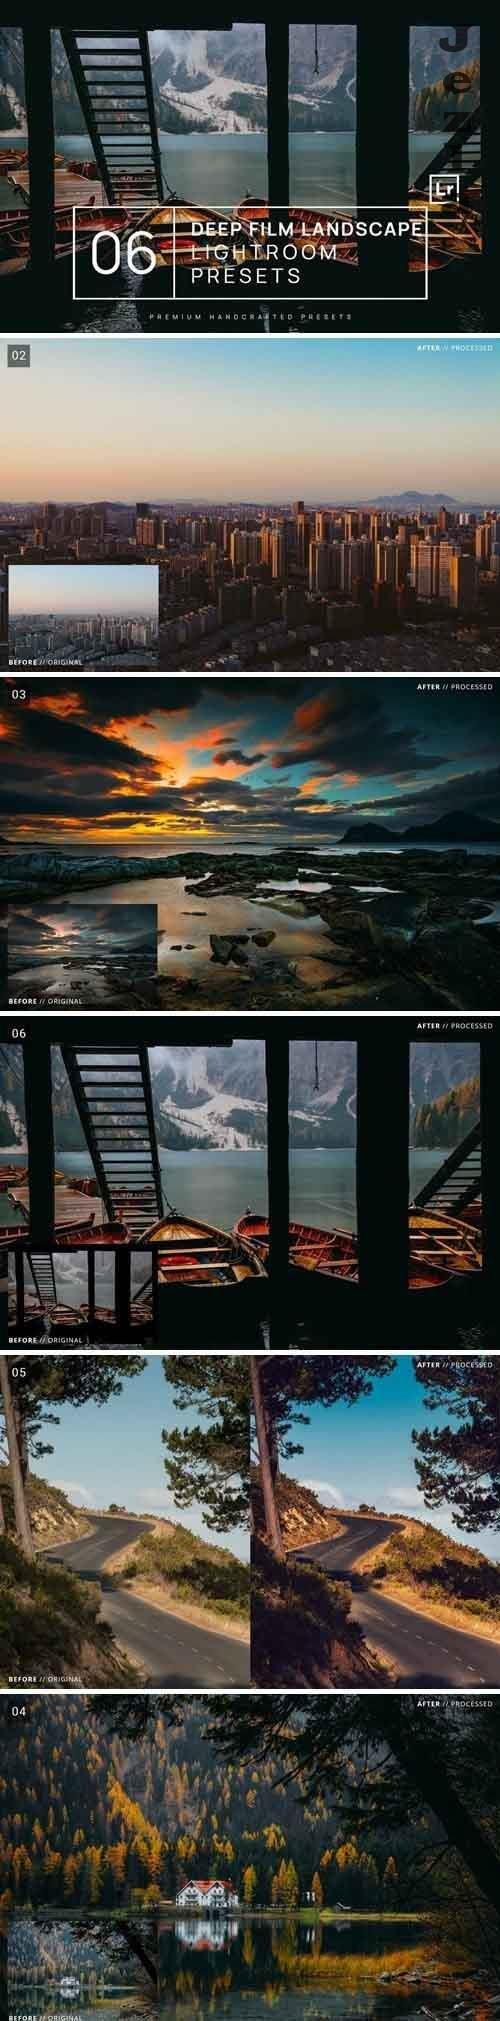 6 Deep Film Landscape LRM Presets + Mobile